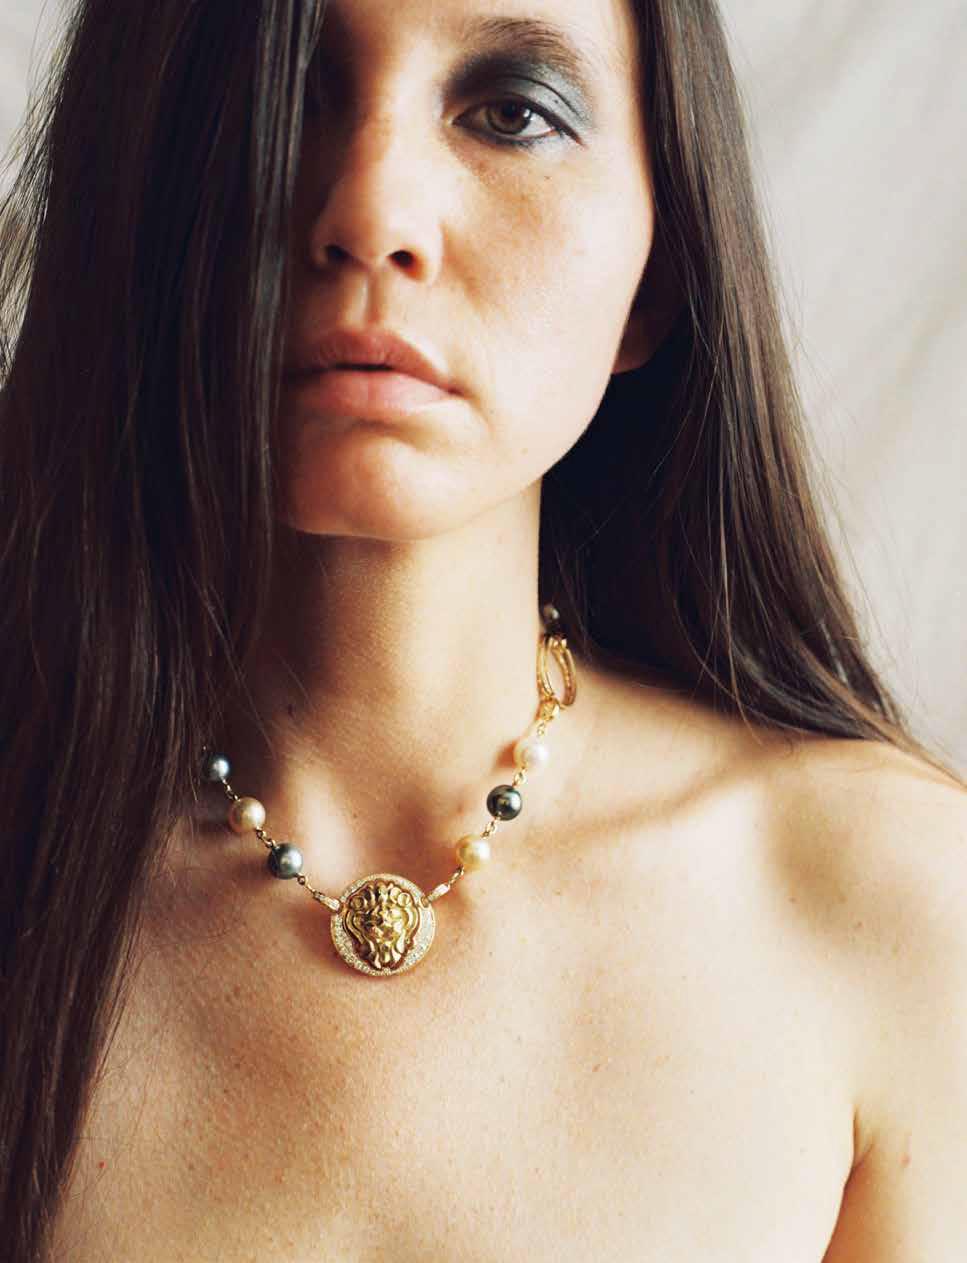 Pg xx Kimbra Chanel Beauty v5-6.jpg